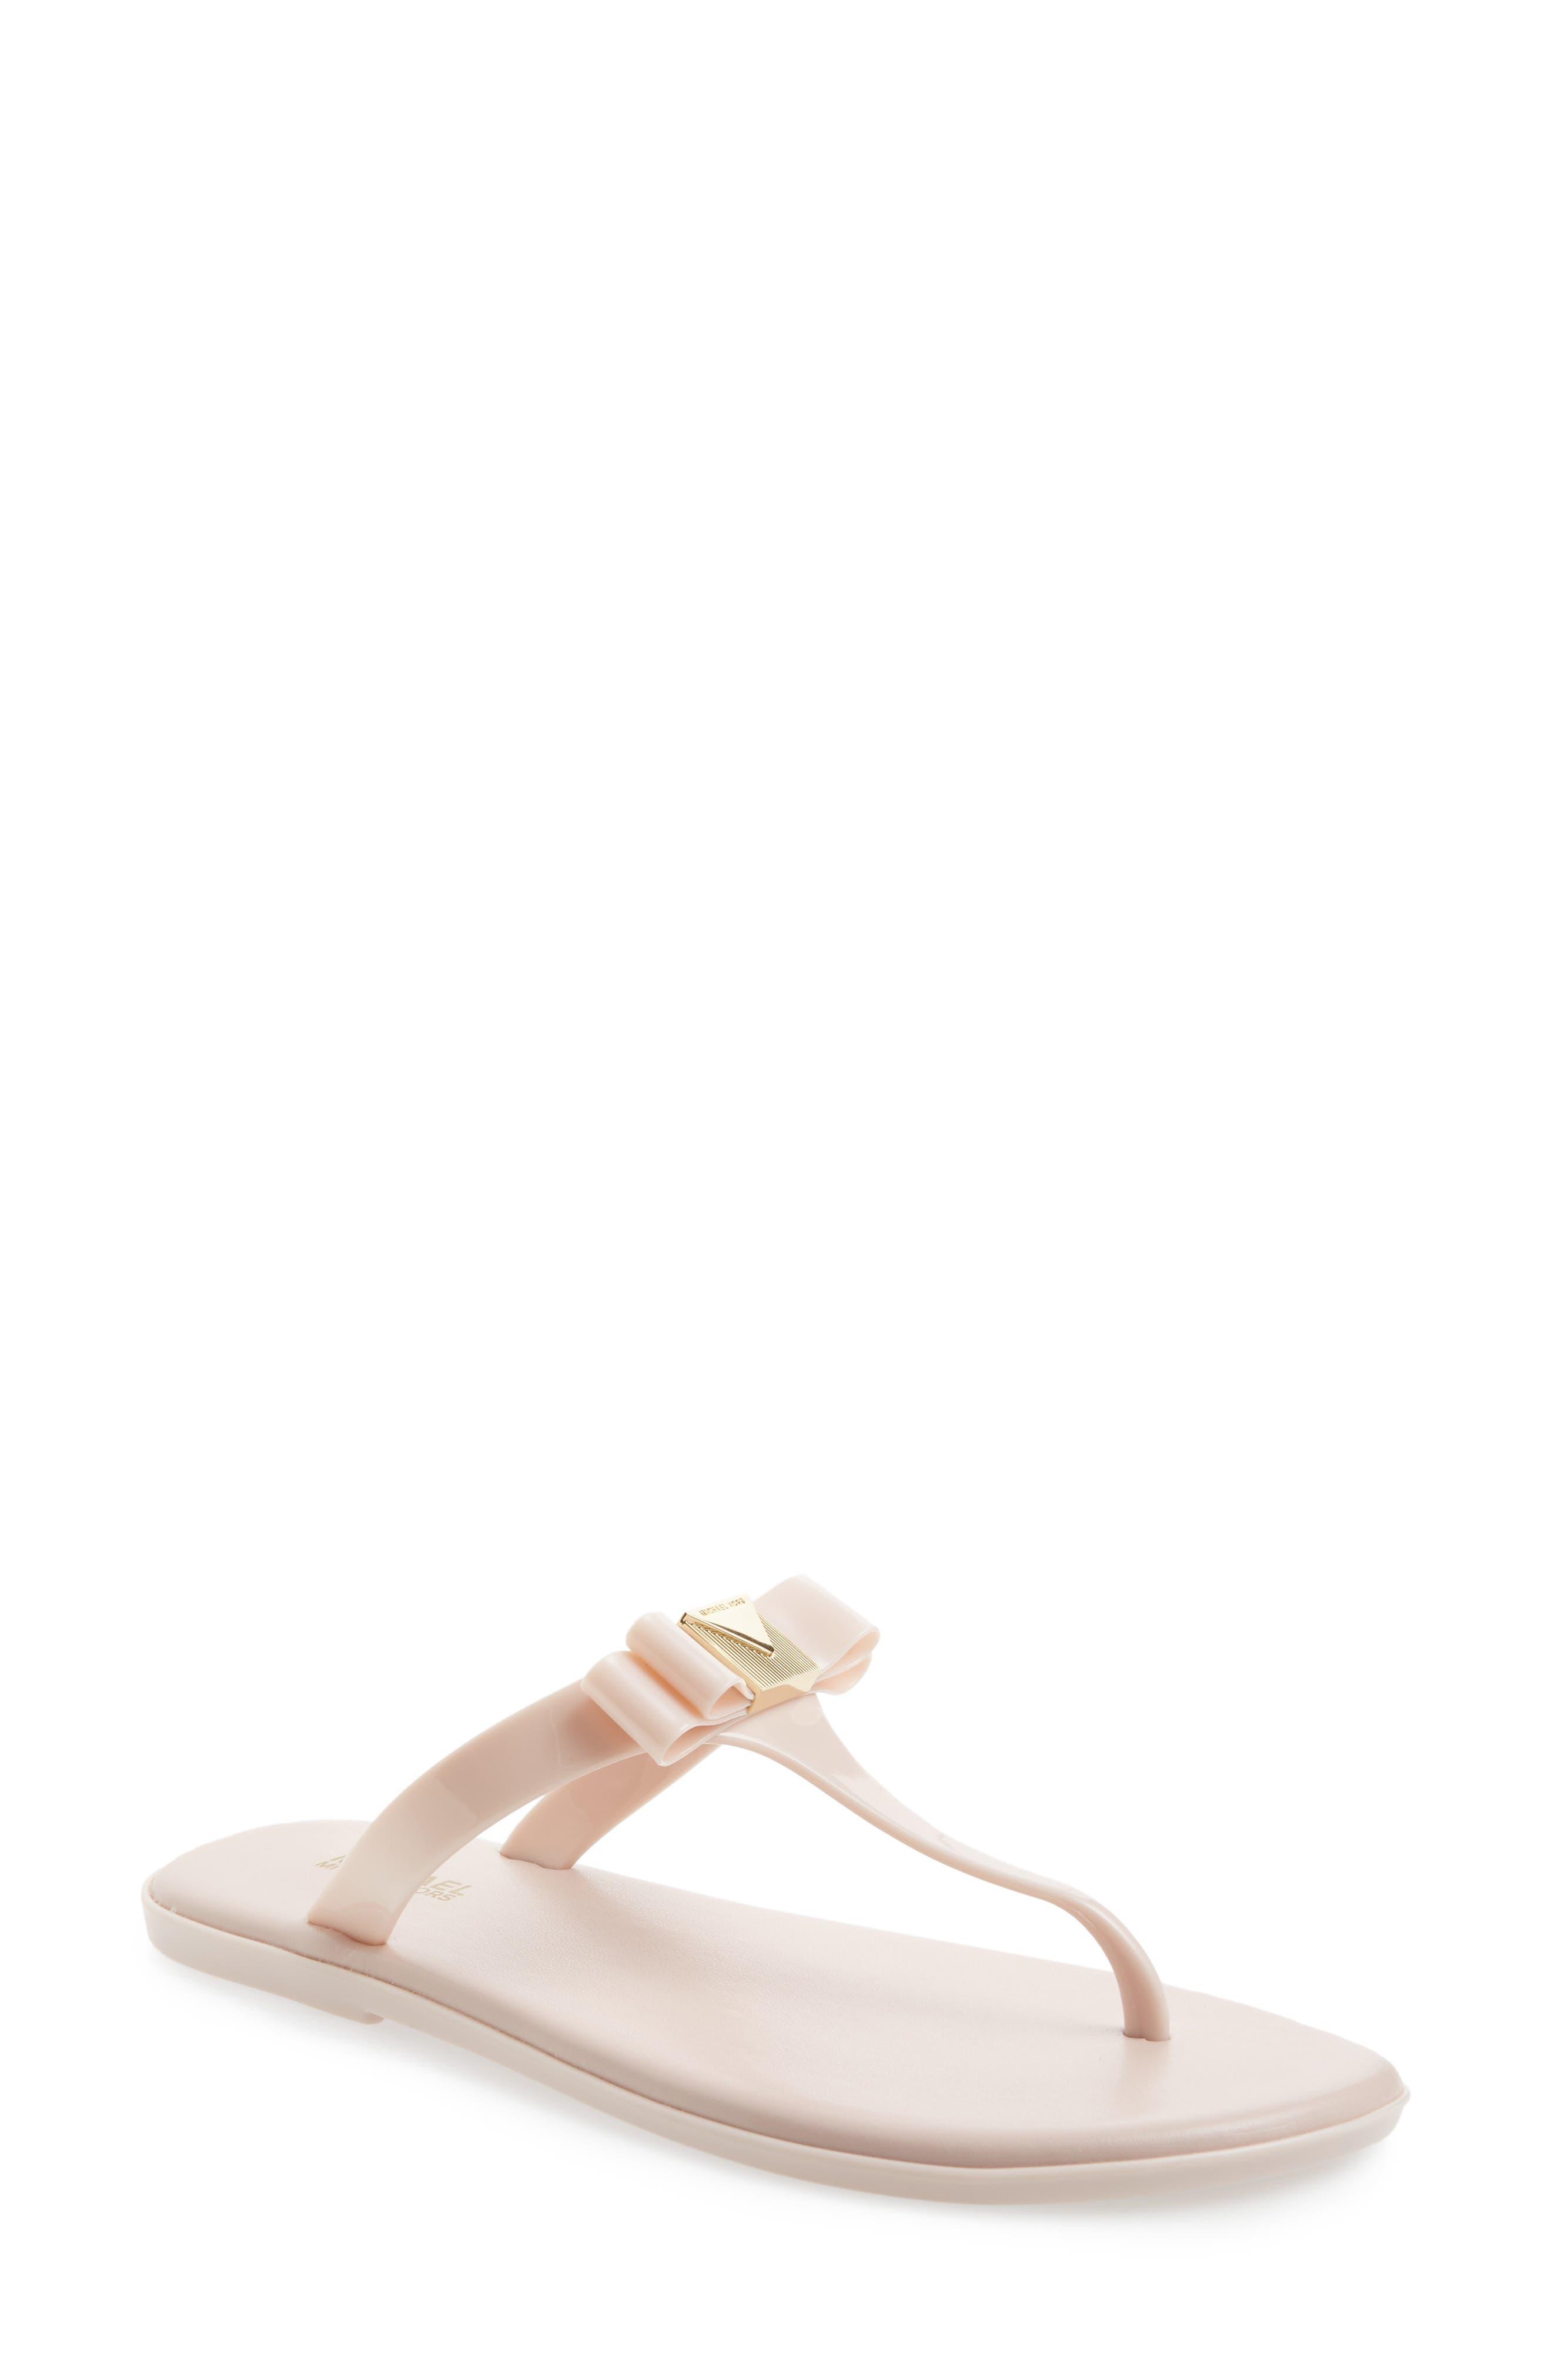 Caroline Jelly Flip Flop,                             Main thumbnail 1, color,                             Soft Pink